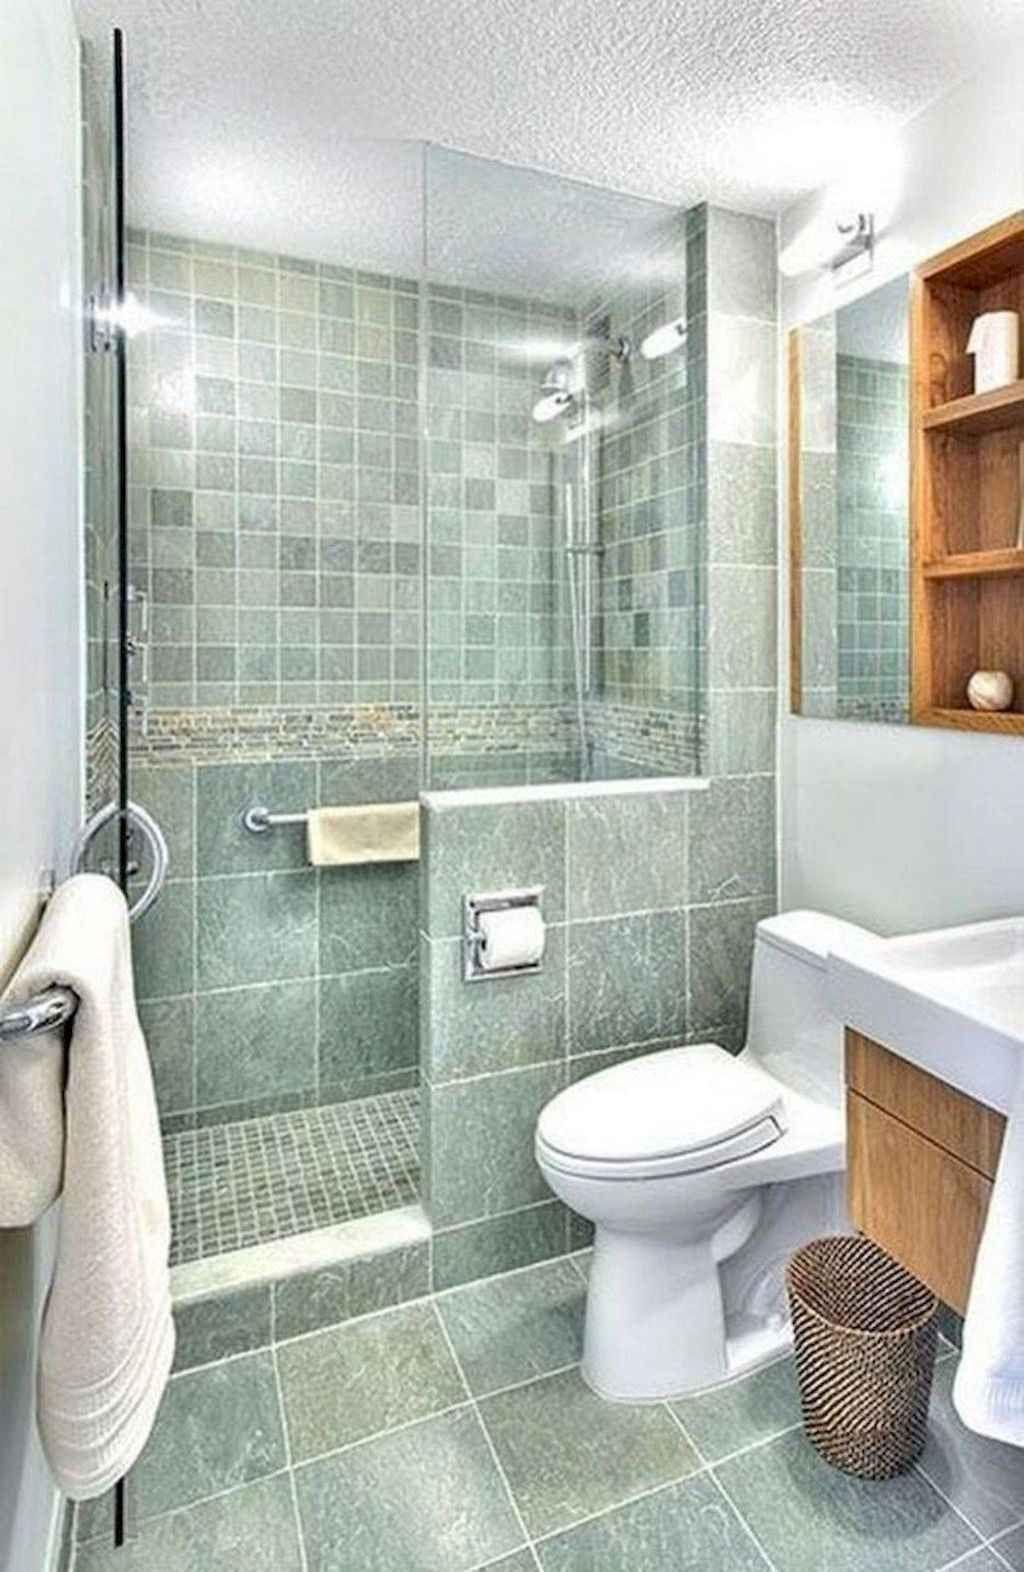 adorable 85 stunning small master bathroom remodel ideas on stunning small bathroom design ideas id=54409